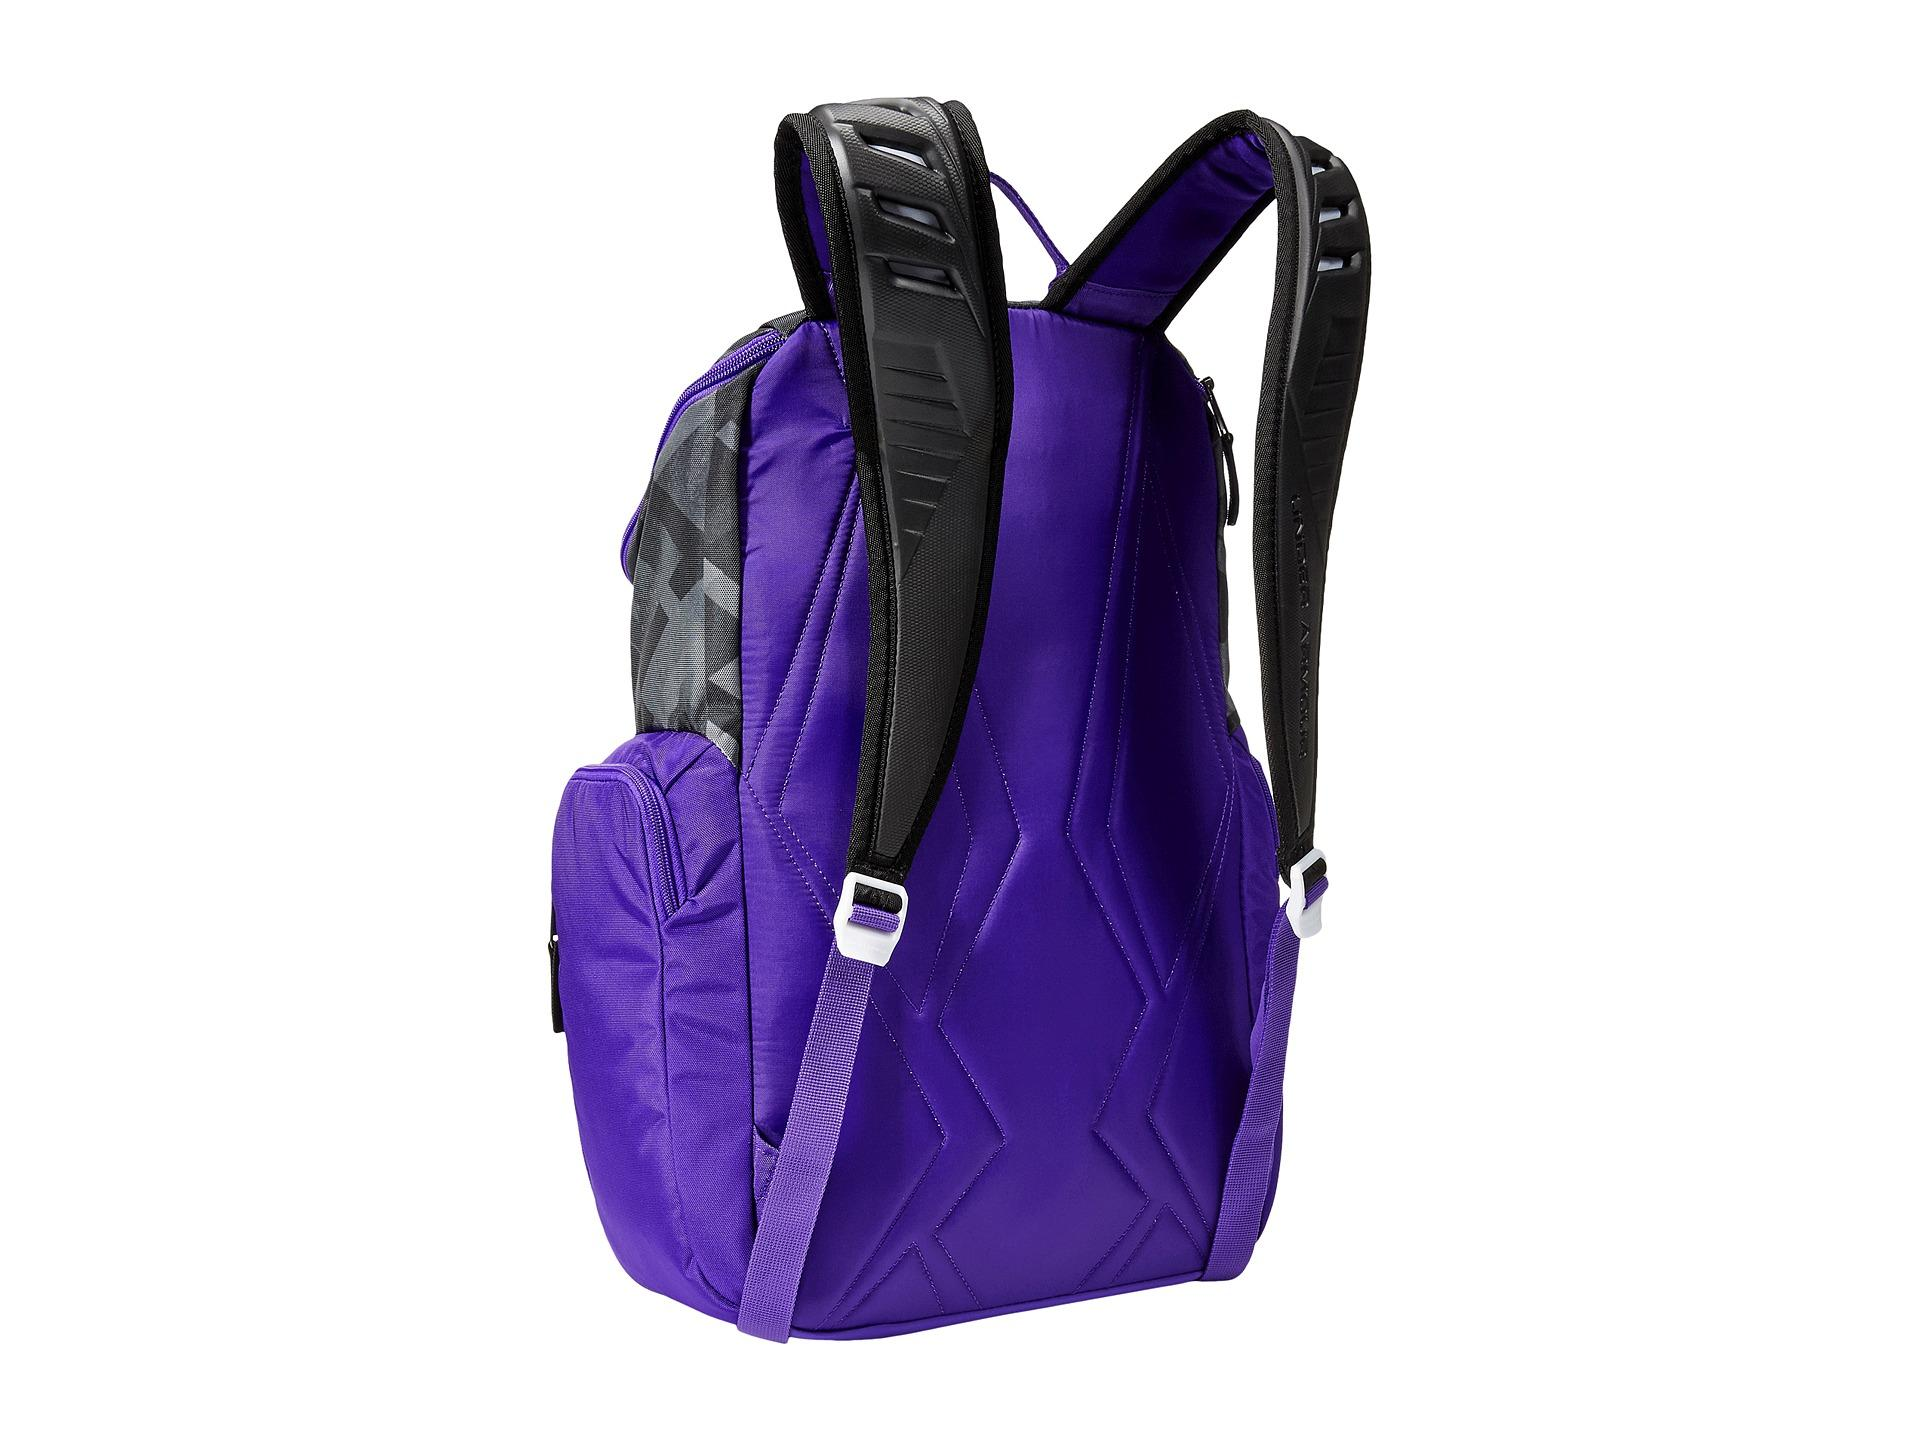 de0d0b47af Lyst - Under Armour Ua Undeniable Backpack Ii in Purple for Men